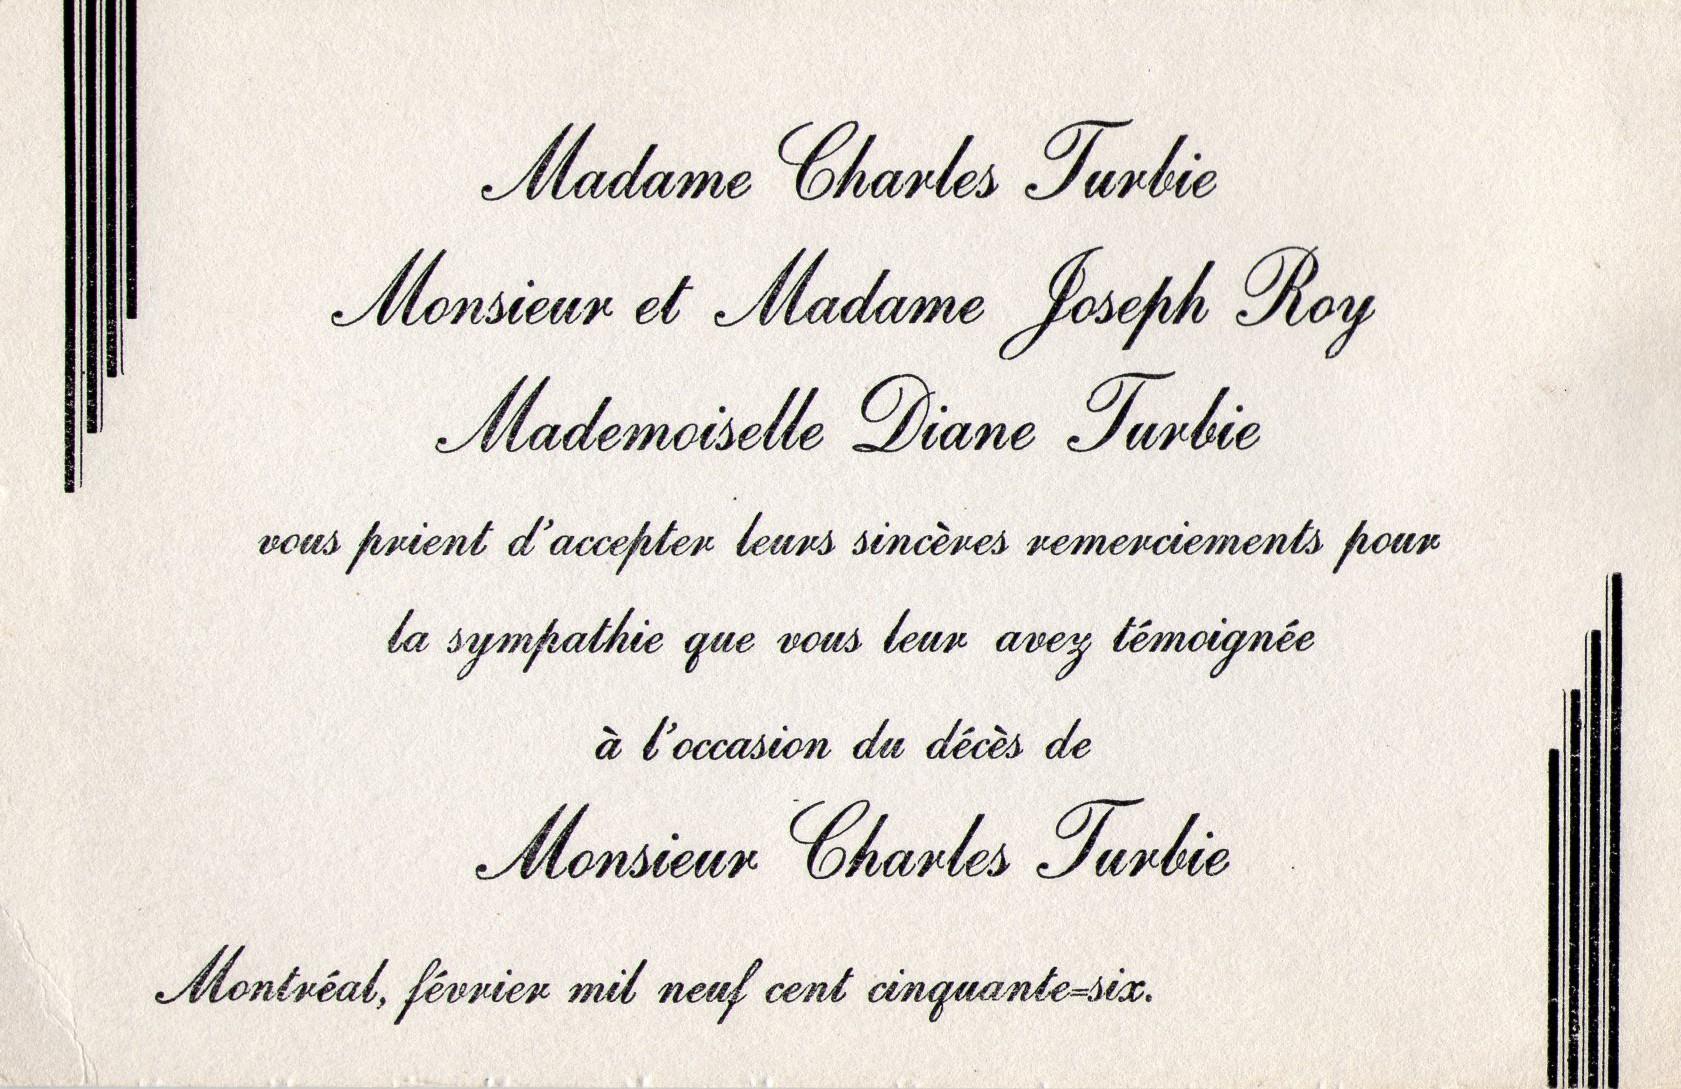 Charles Turbis